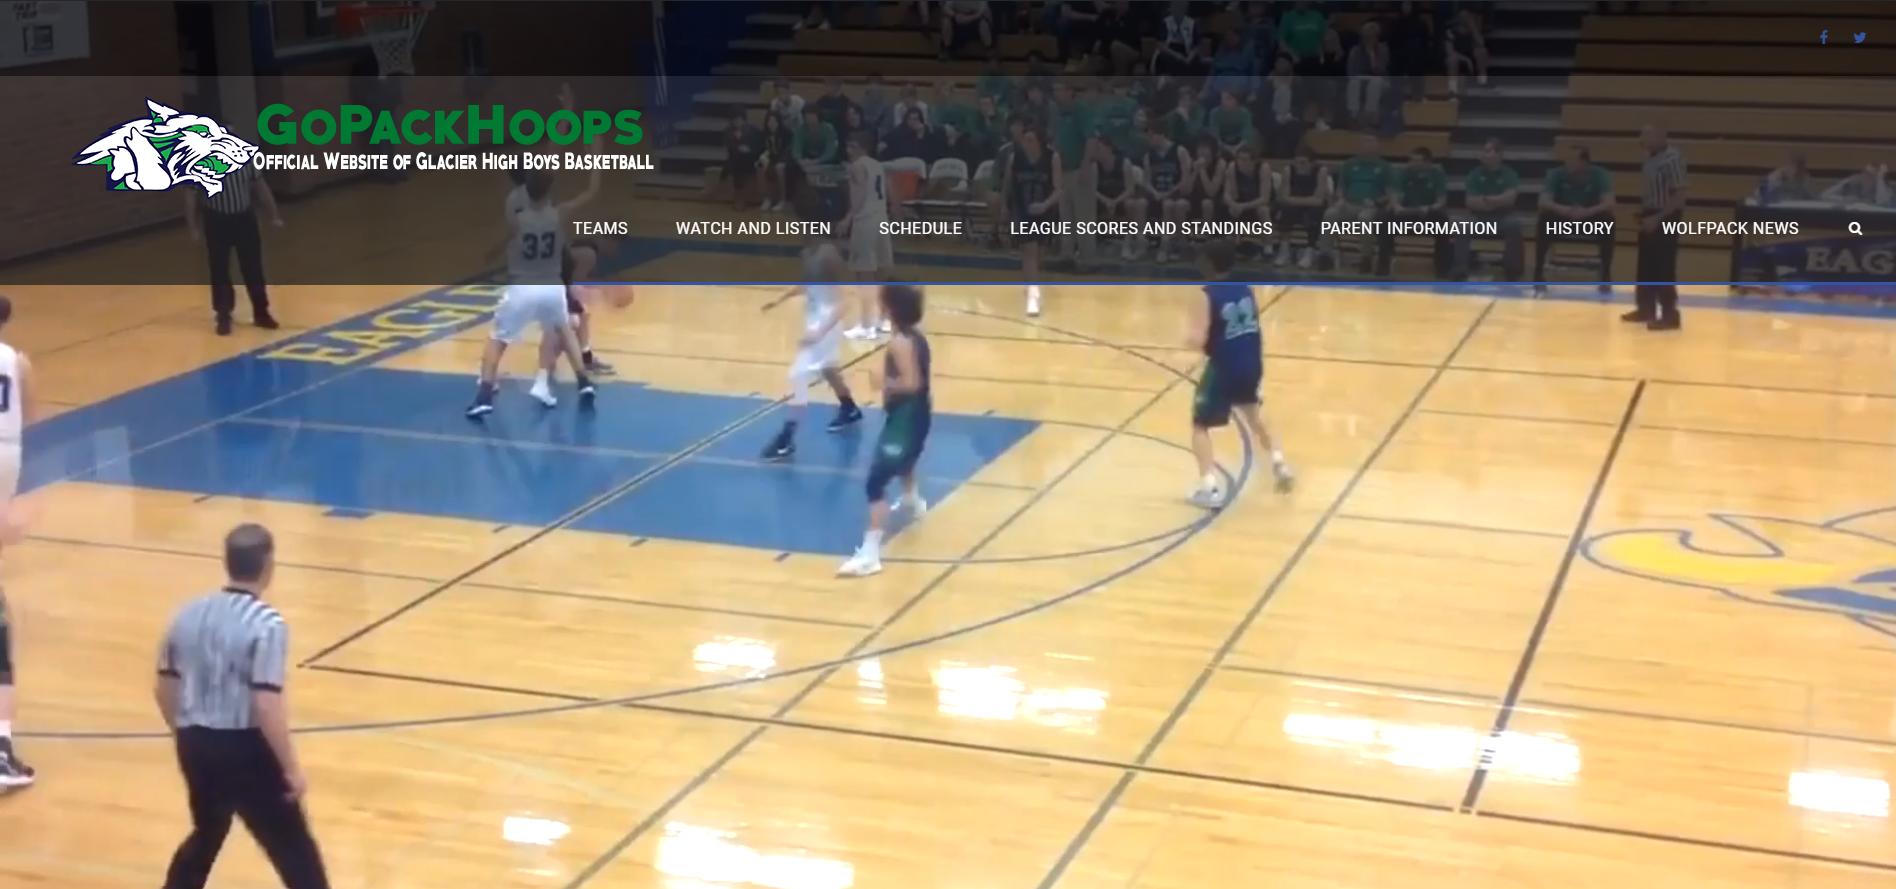 glacier high school boys basketball screenshot